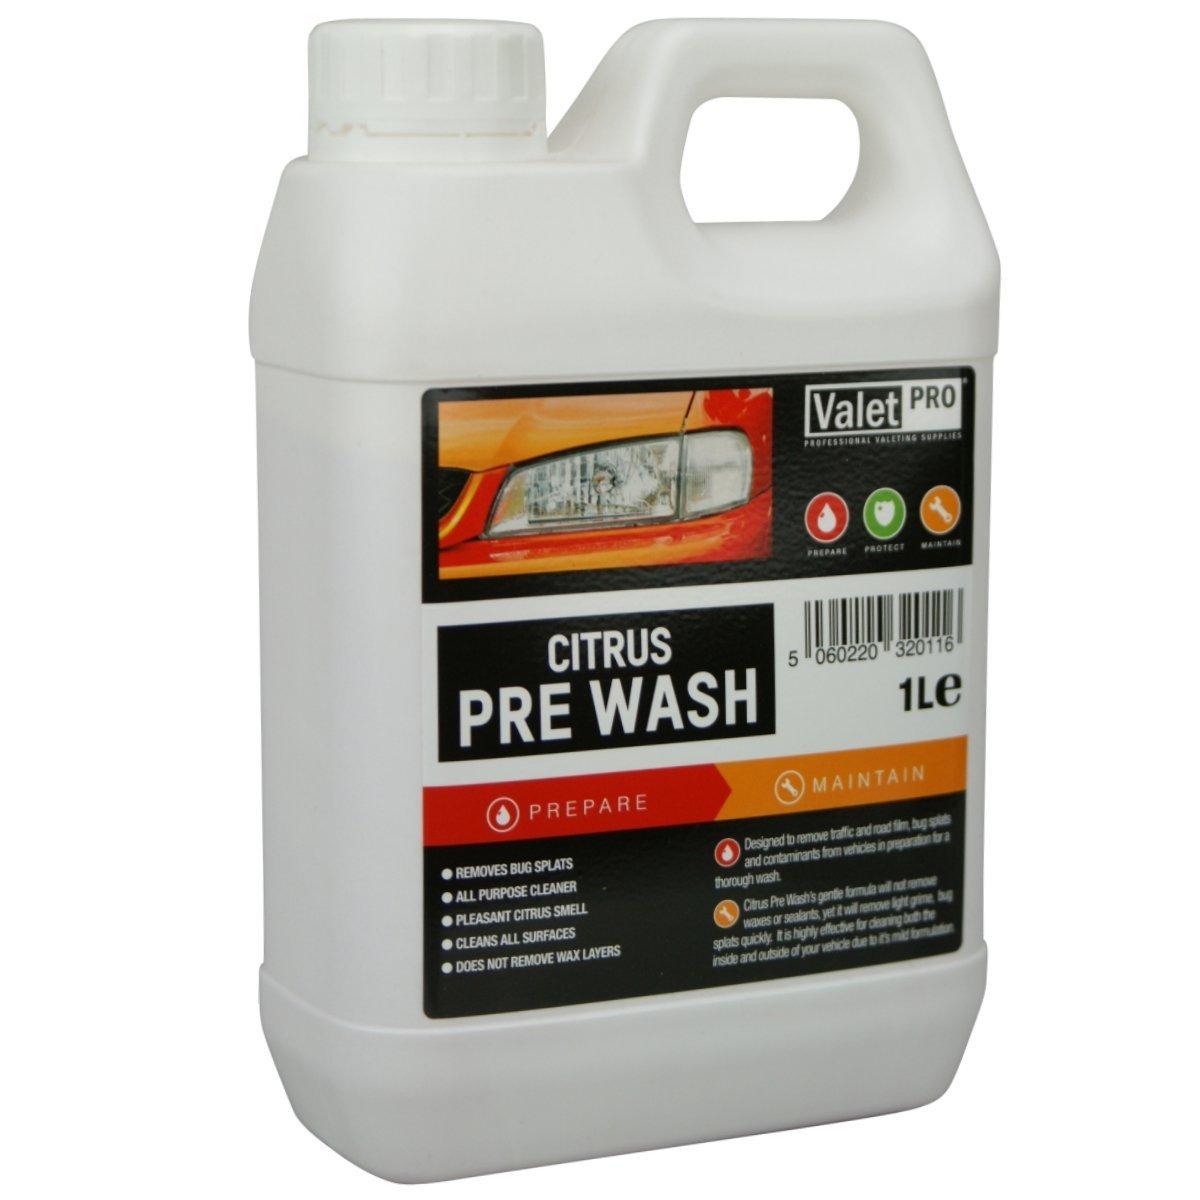 Valet PRO - Citrus Pre-Wash 1L ValetPRO 4001